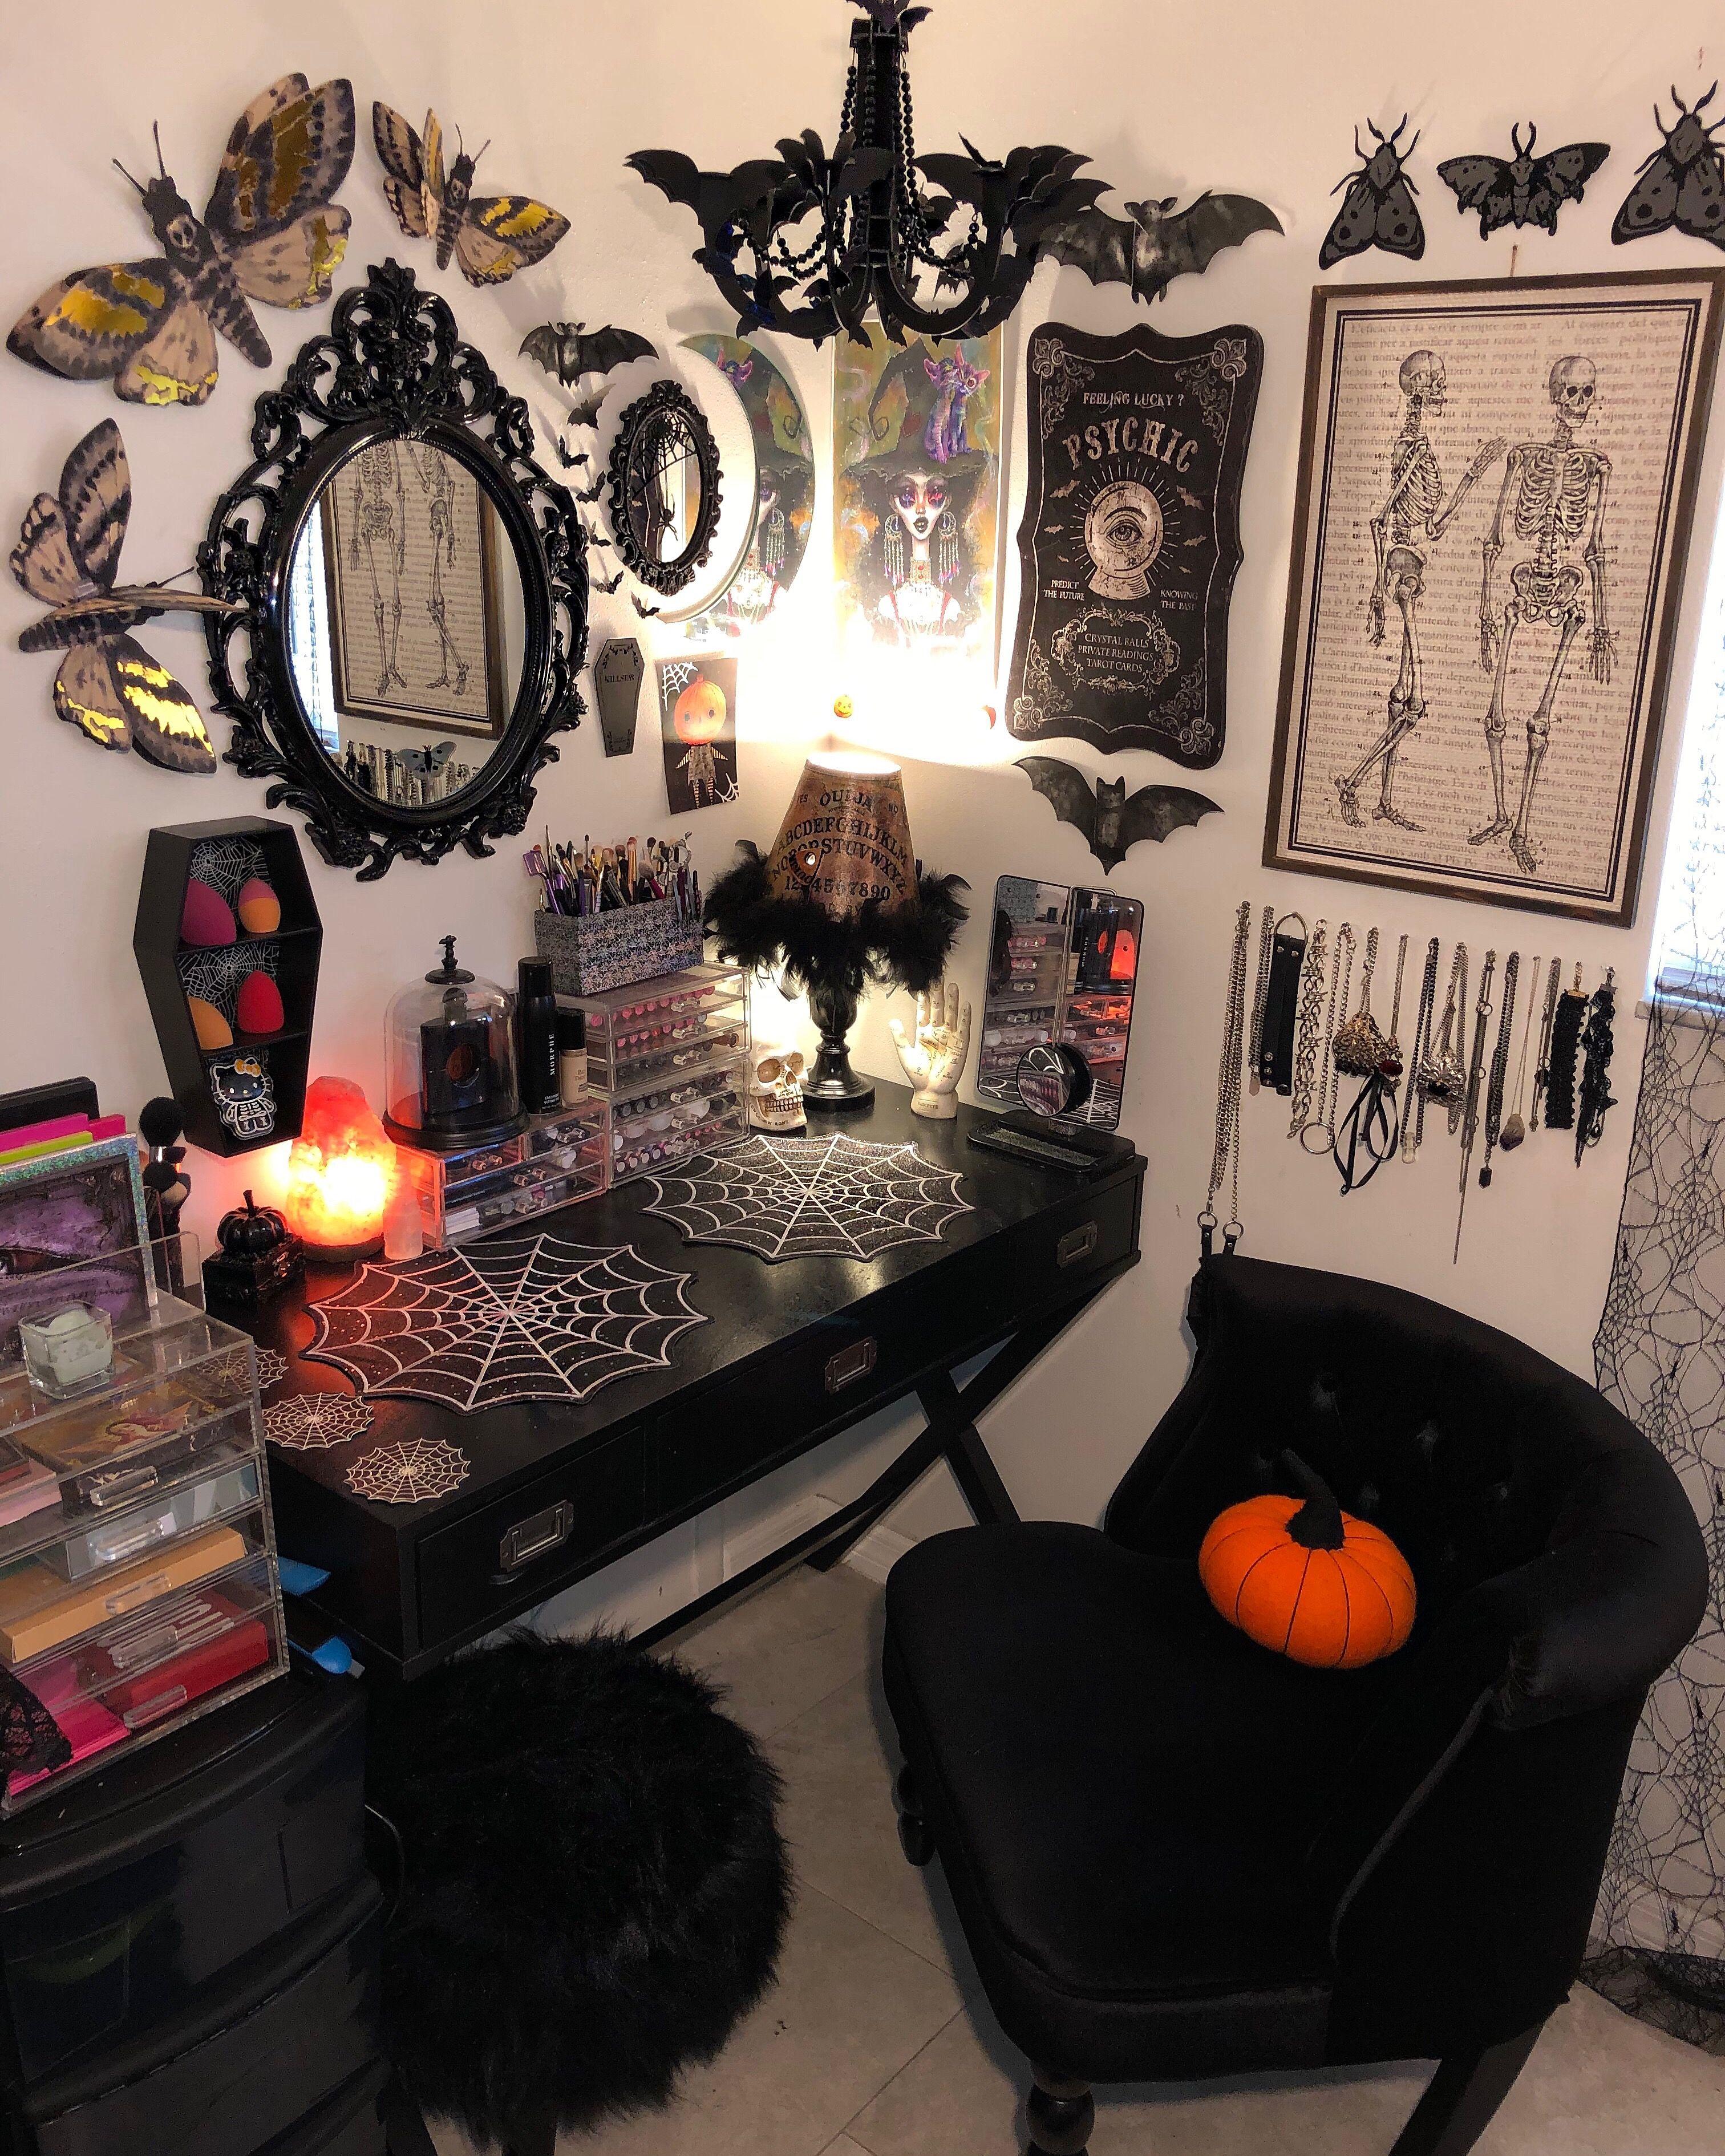 My Sanctuary Ig Lady Sylph Goth Gothdecor Halloween Spooky Creepy Gothhome Spookyhome Hallow Halloween Room Decor Goth Home Decor Dark Home Decor